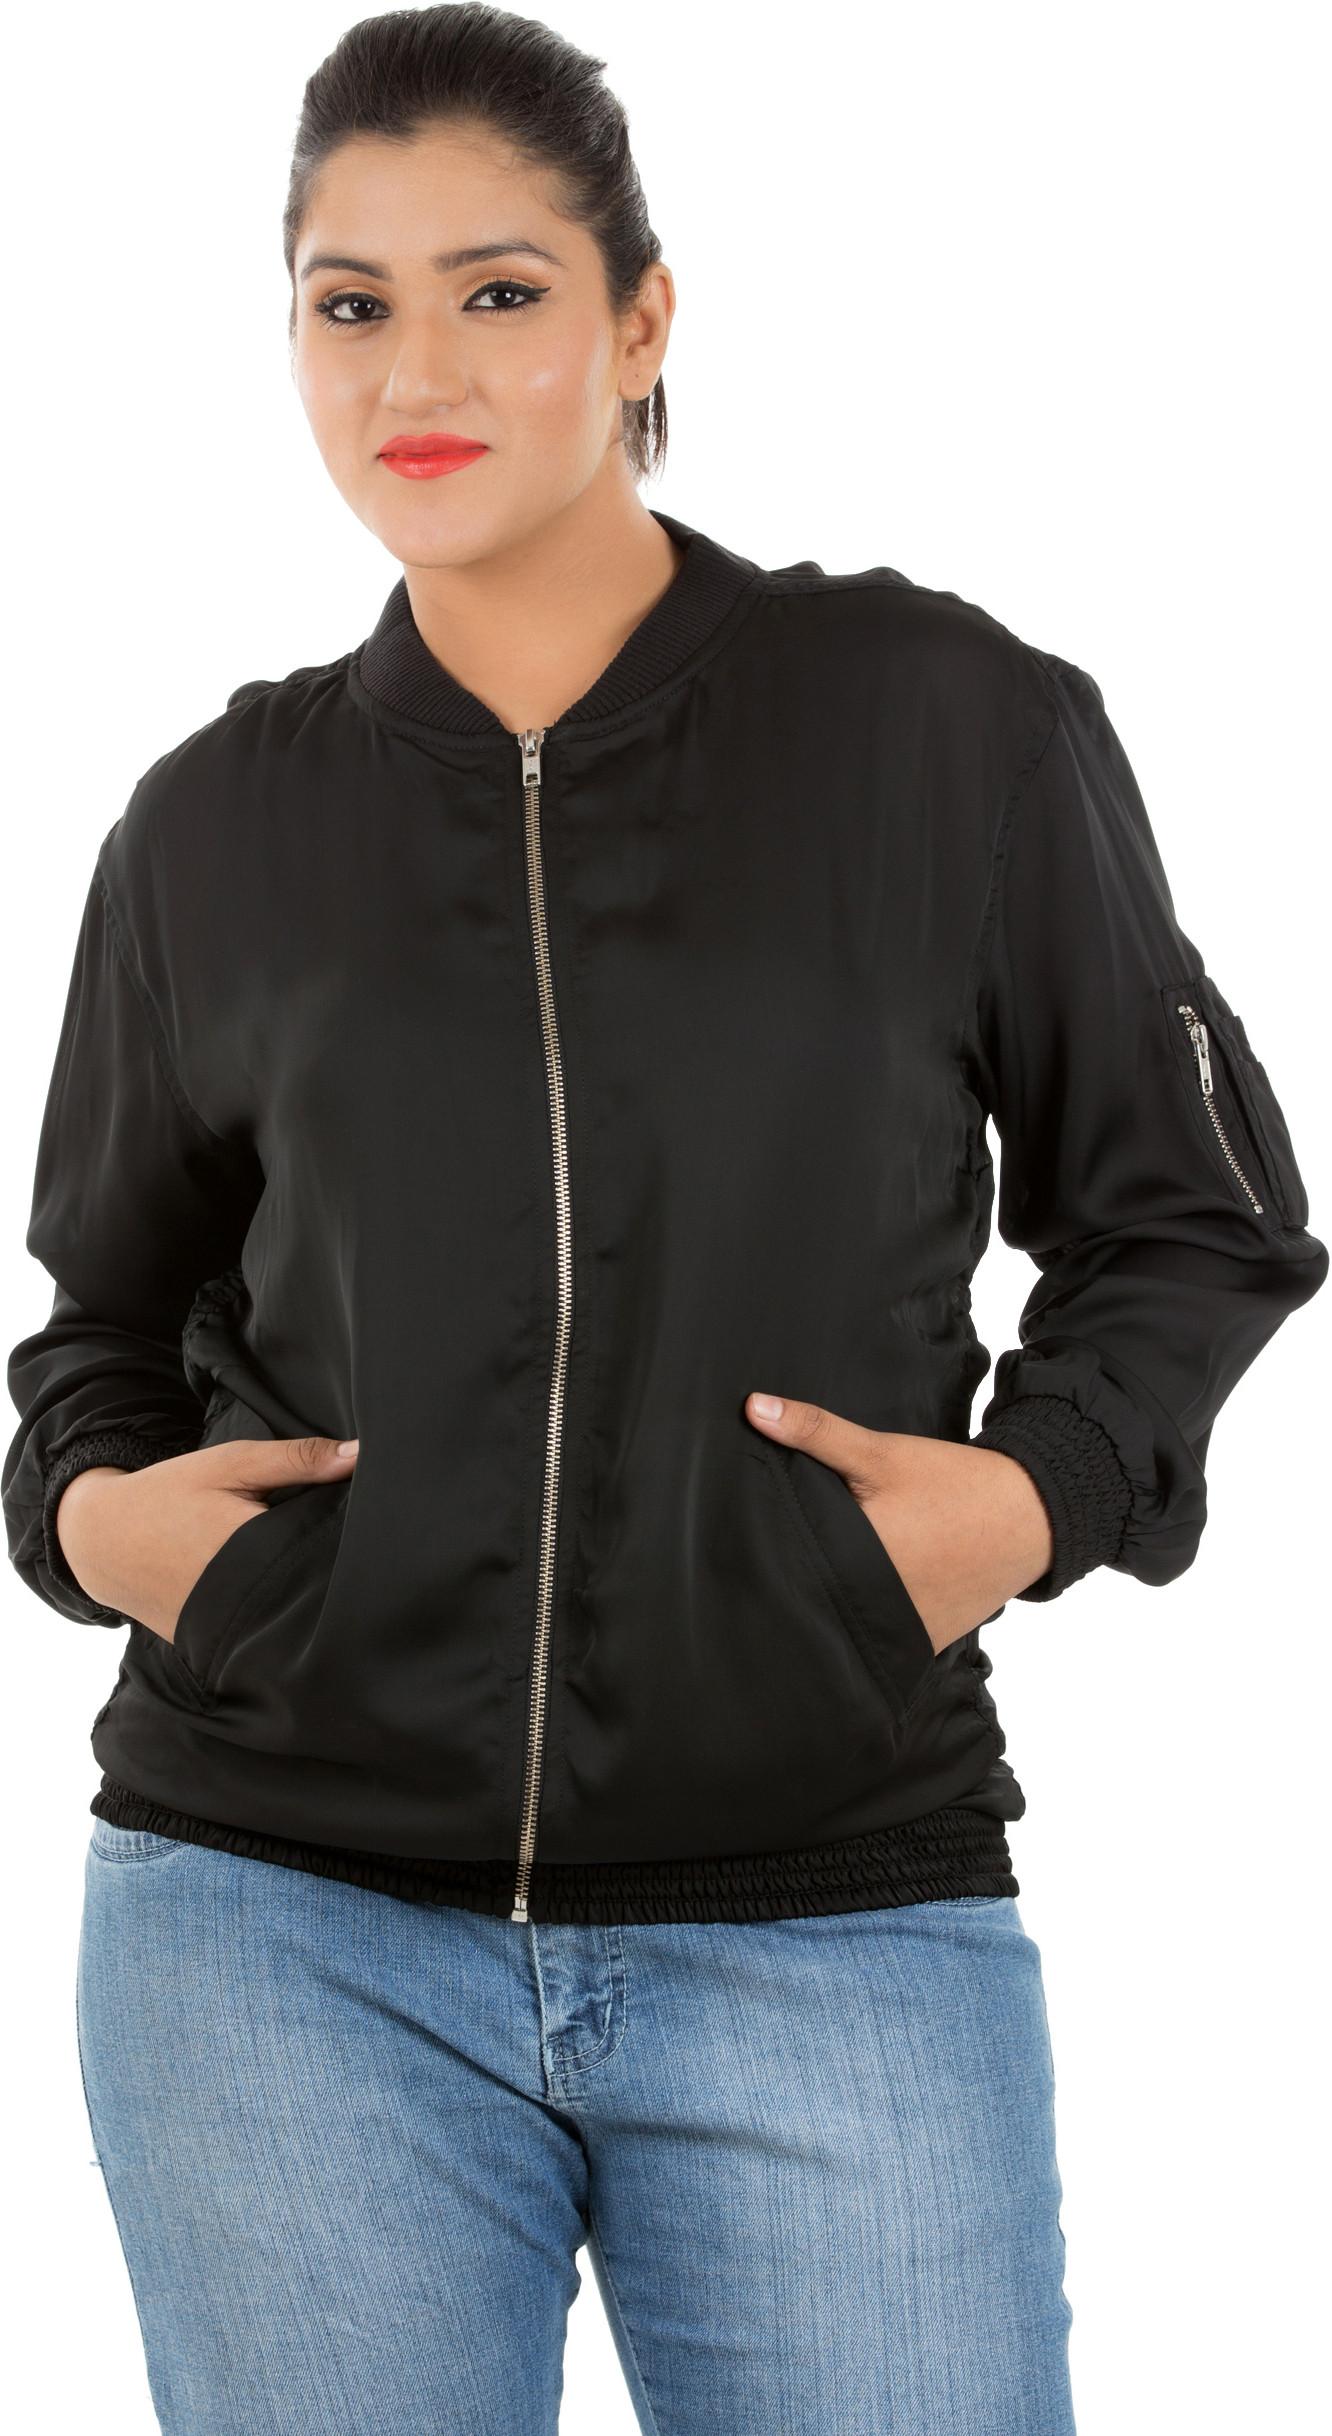 LASTINCH Full Sleeve Solid Womens Jacket